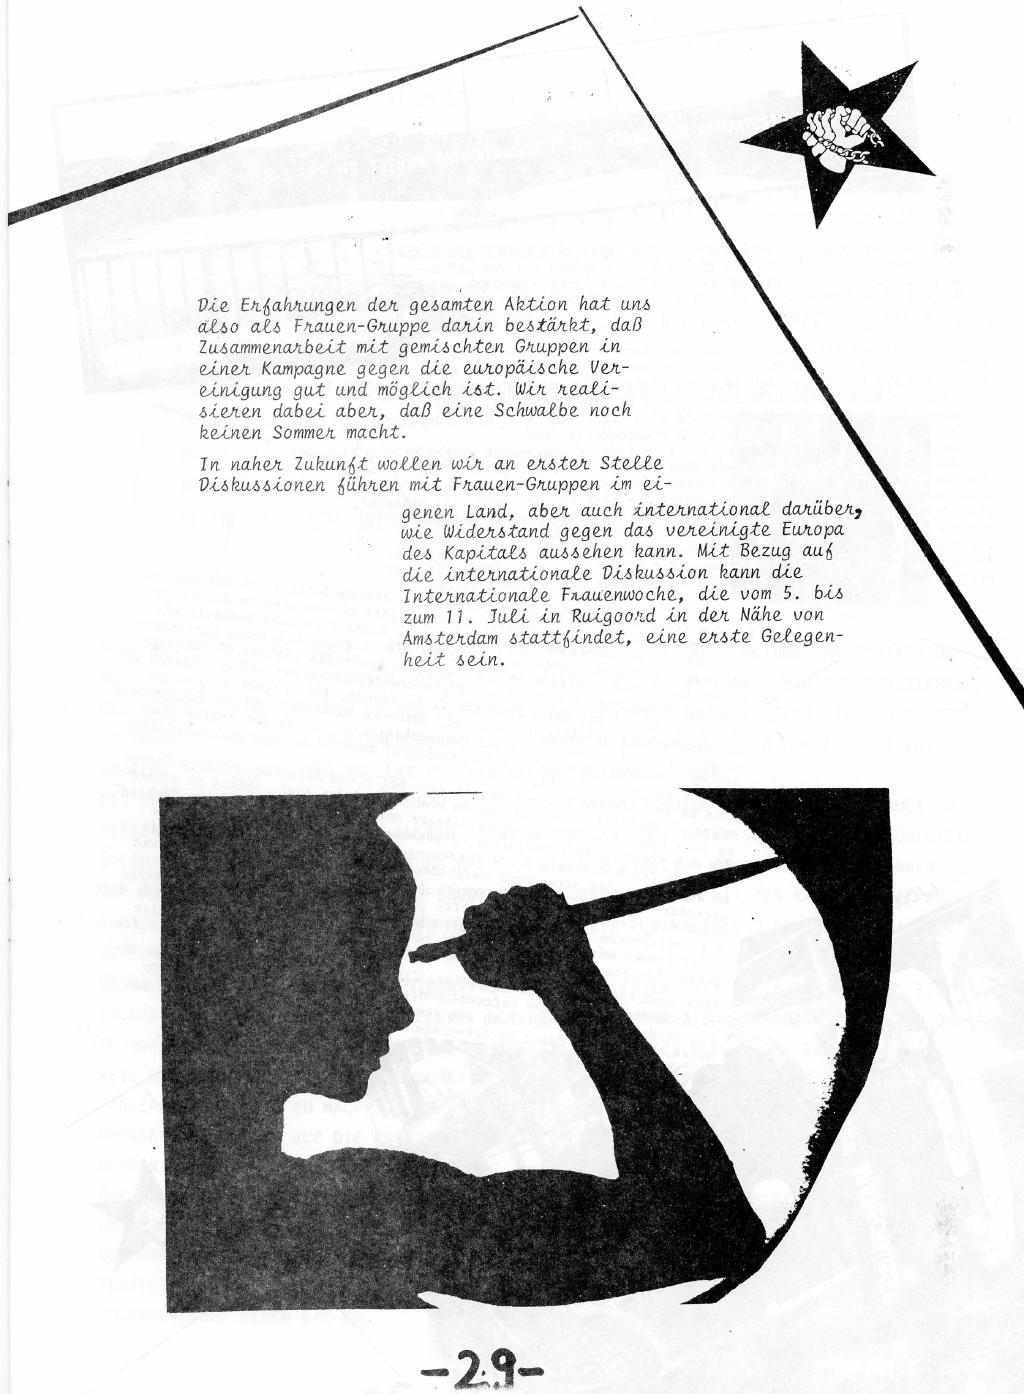 Belgien_Doku_Besetzung_EG_Kommission_1989_031